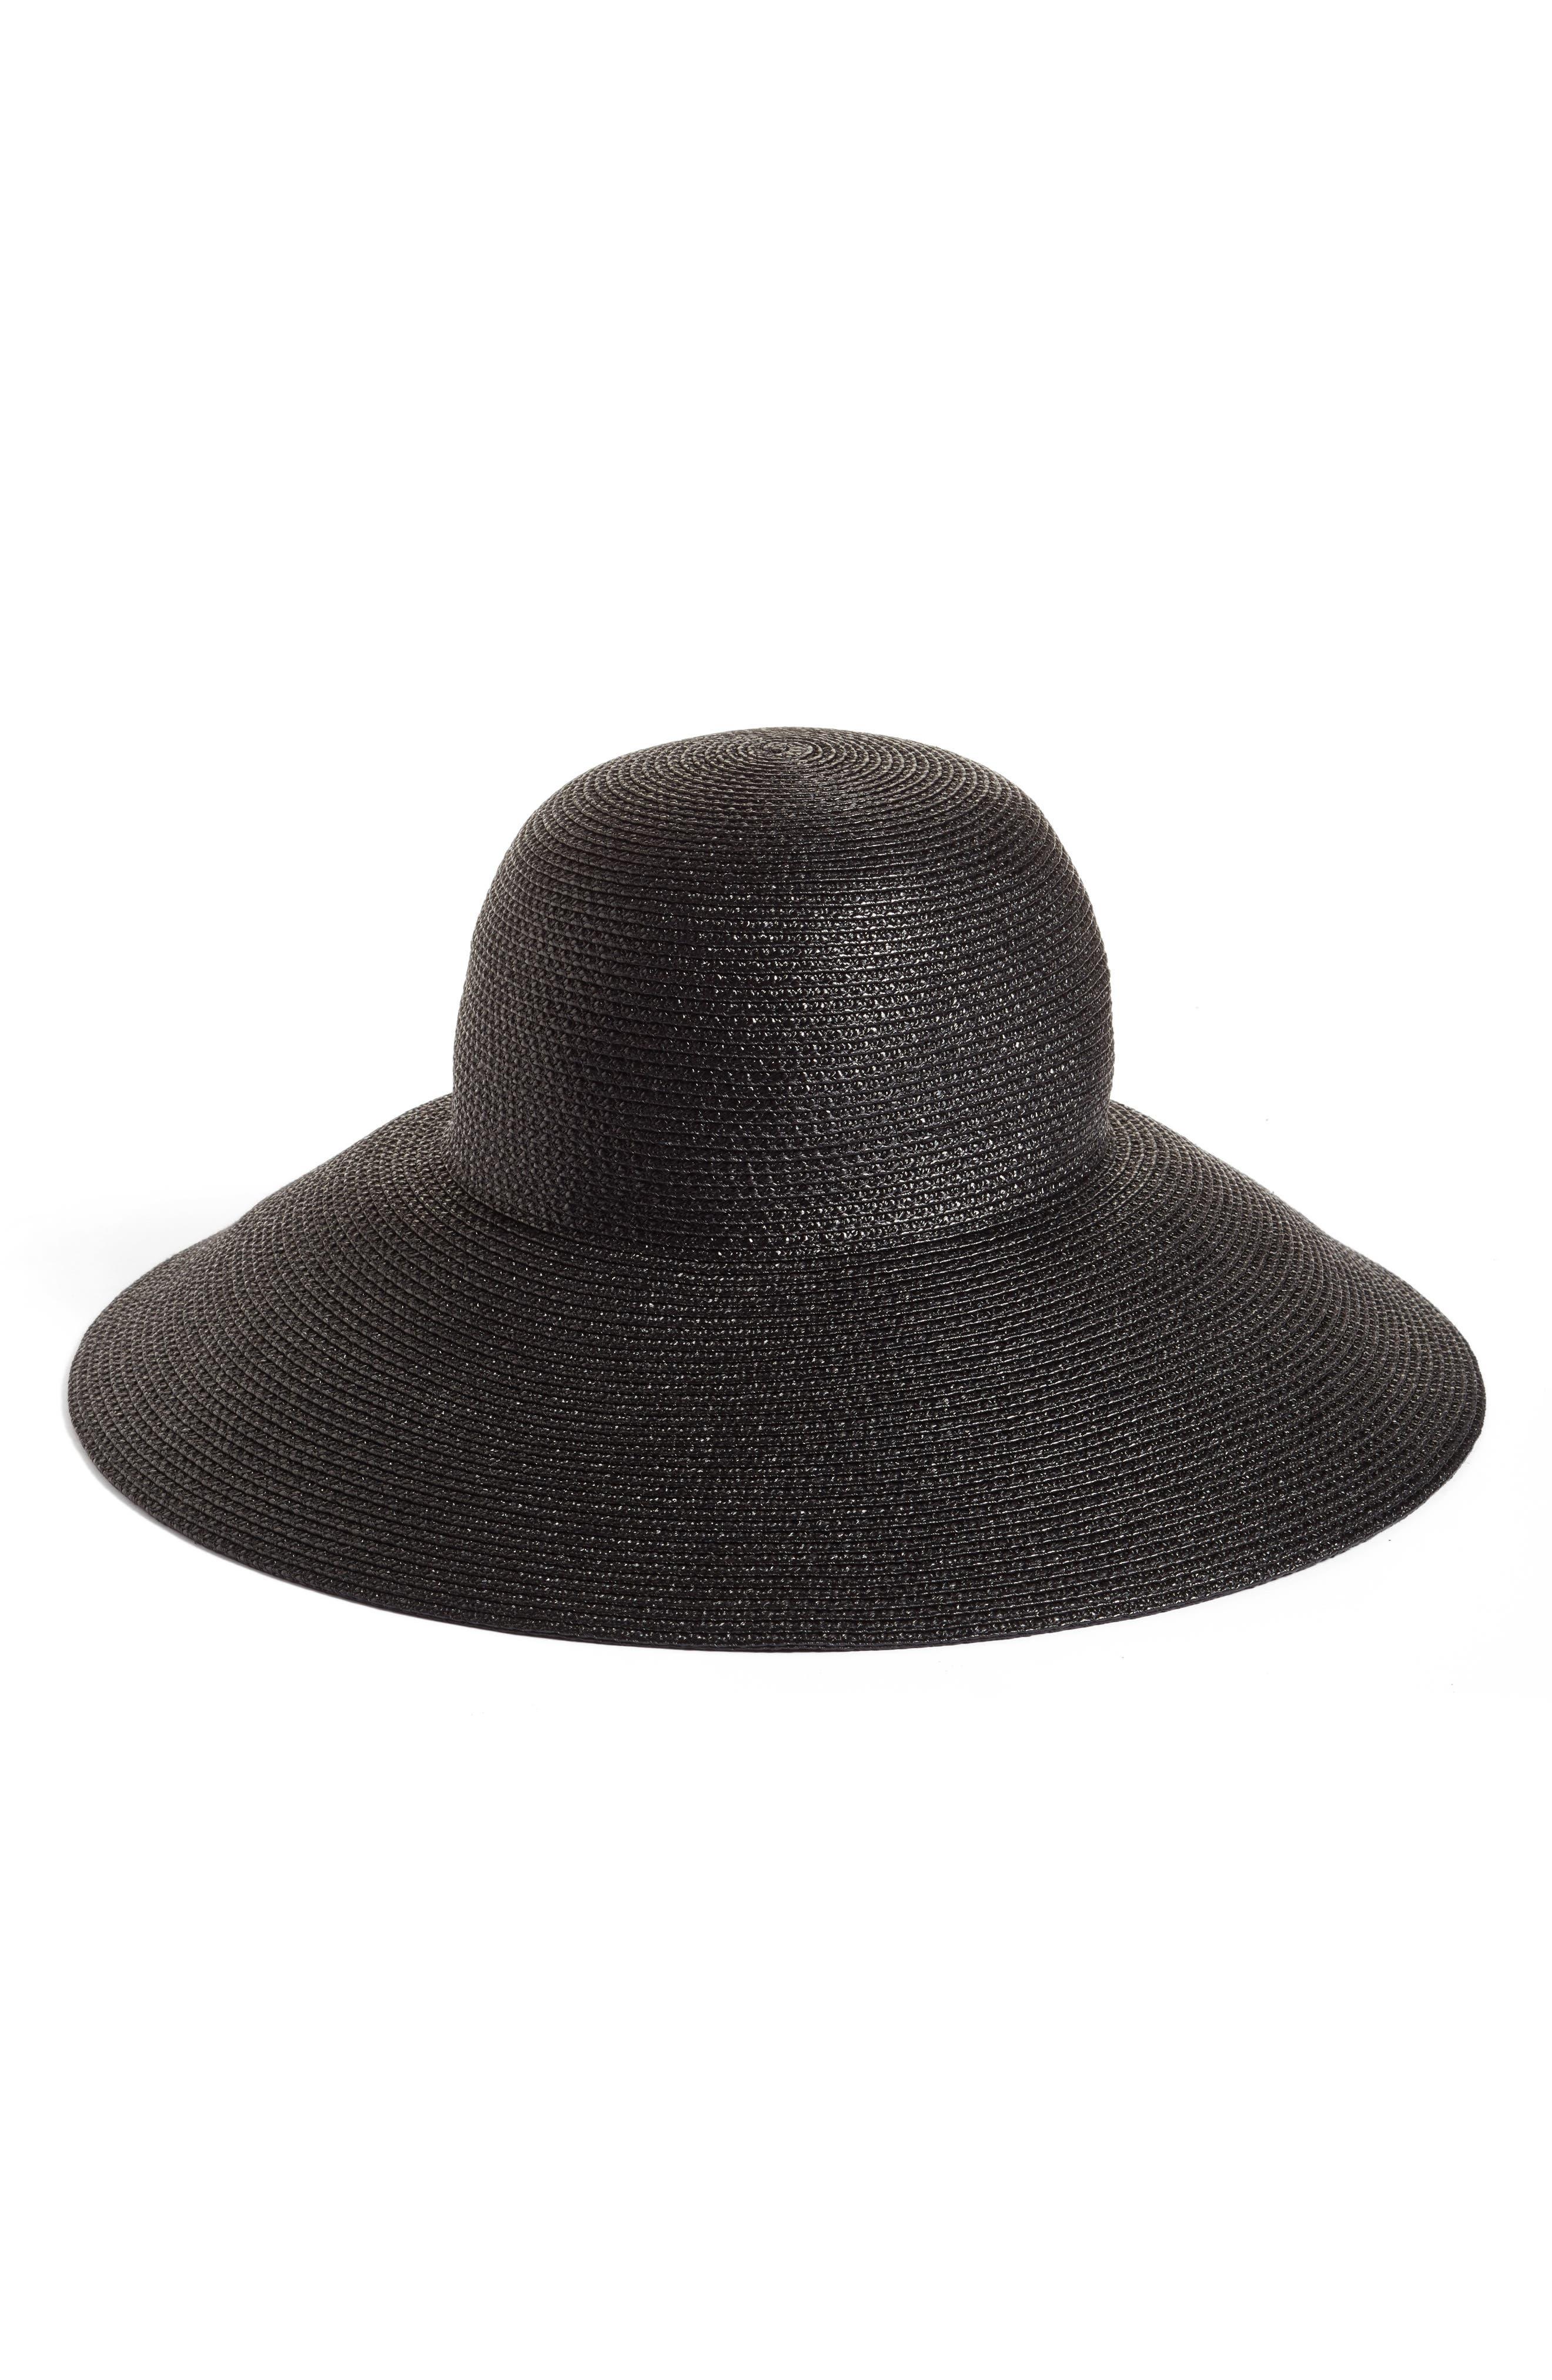 ERIC JAVITS Bella Squishee<sup>®</sup> Sun Hat